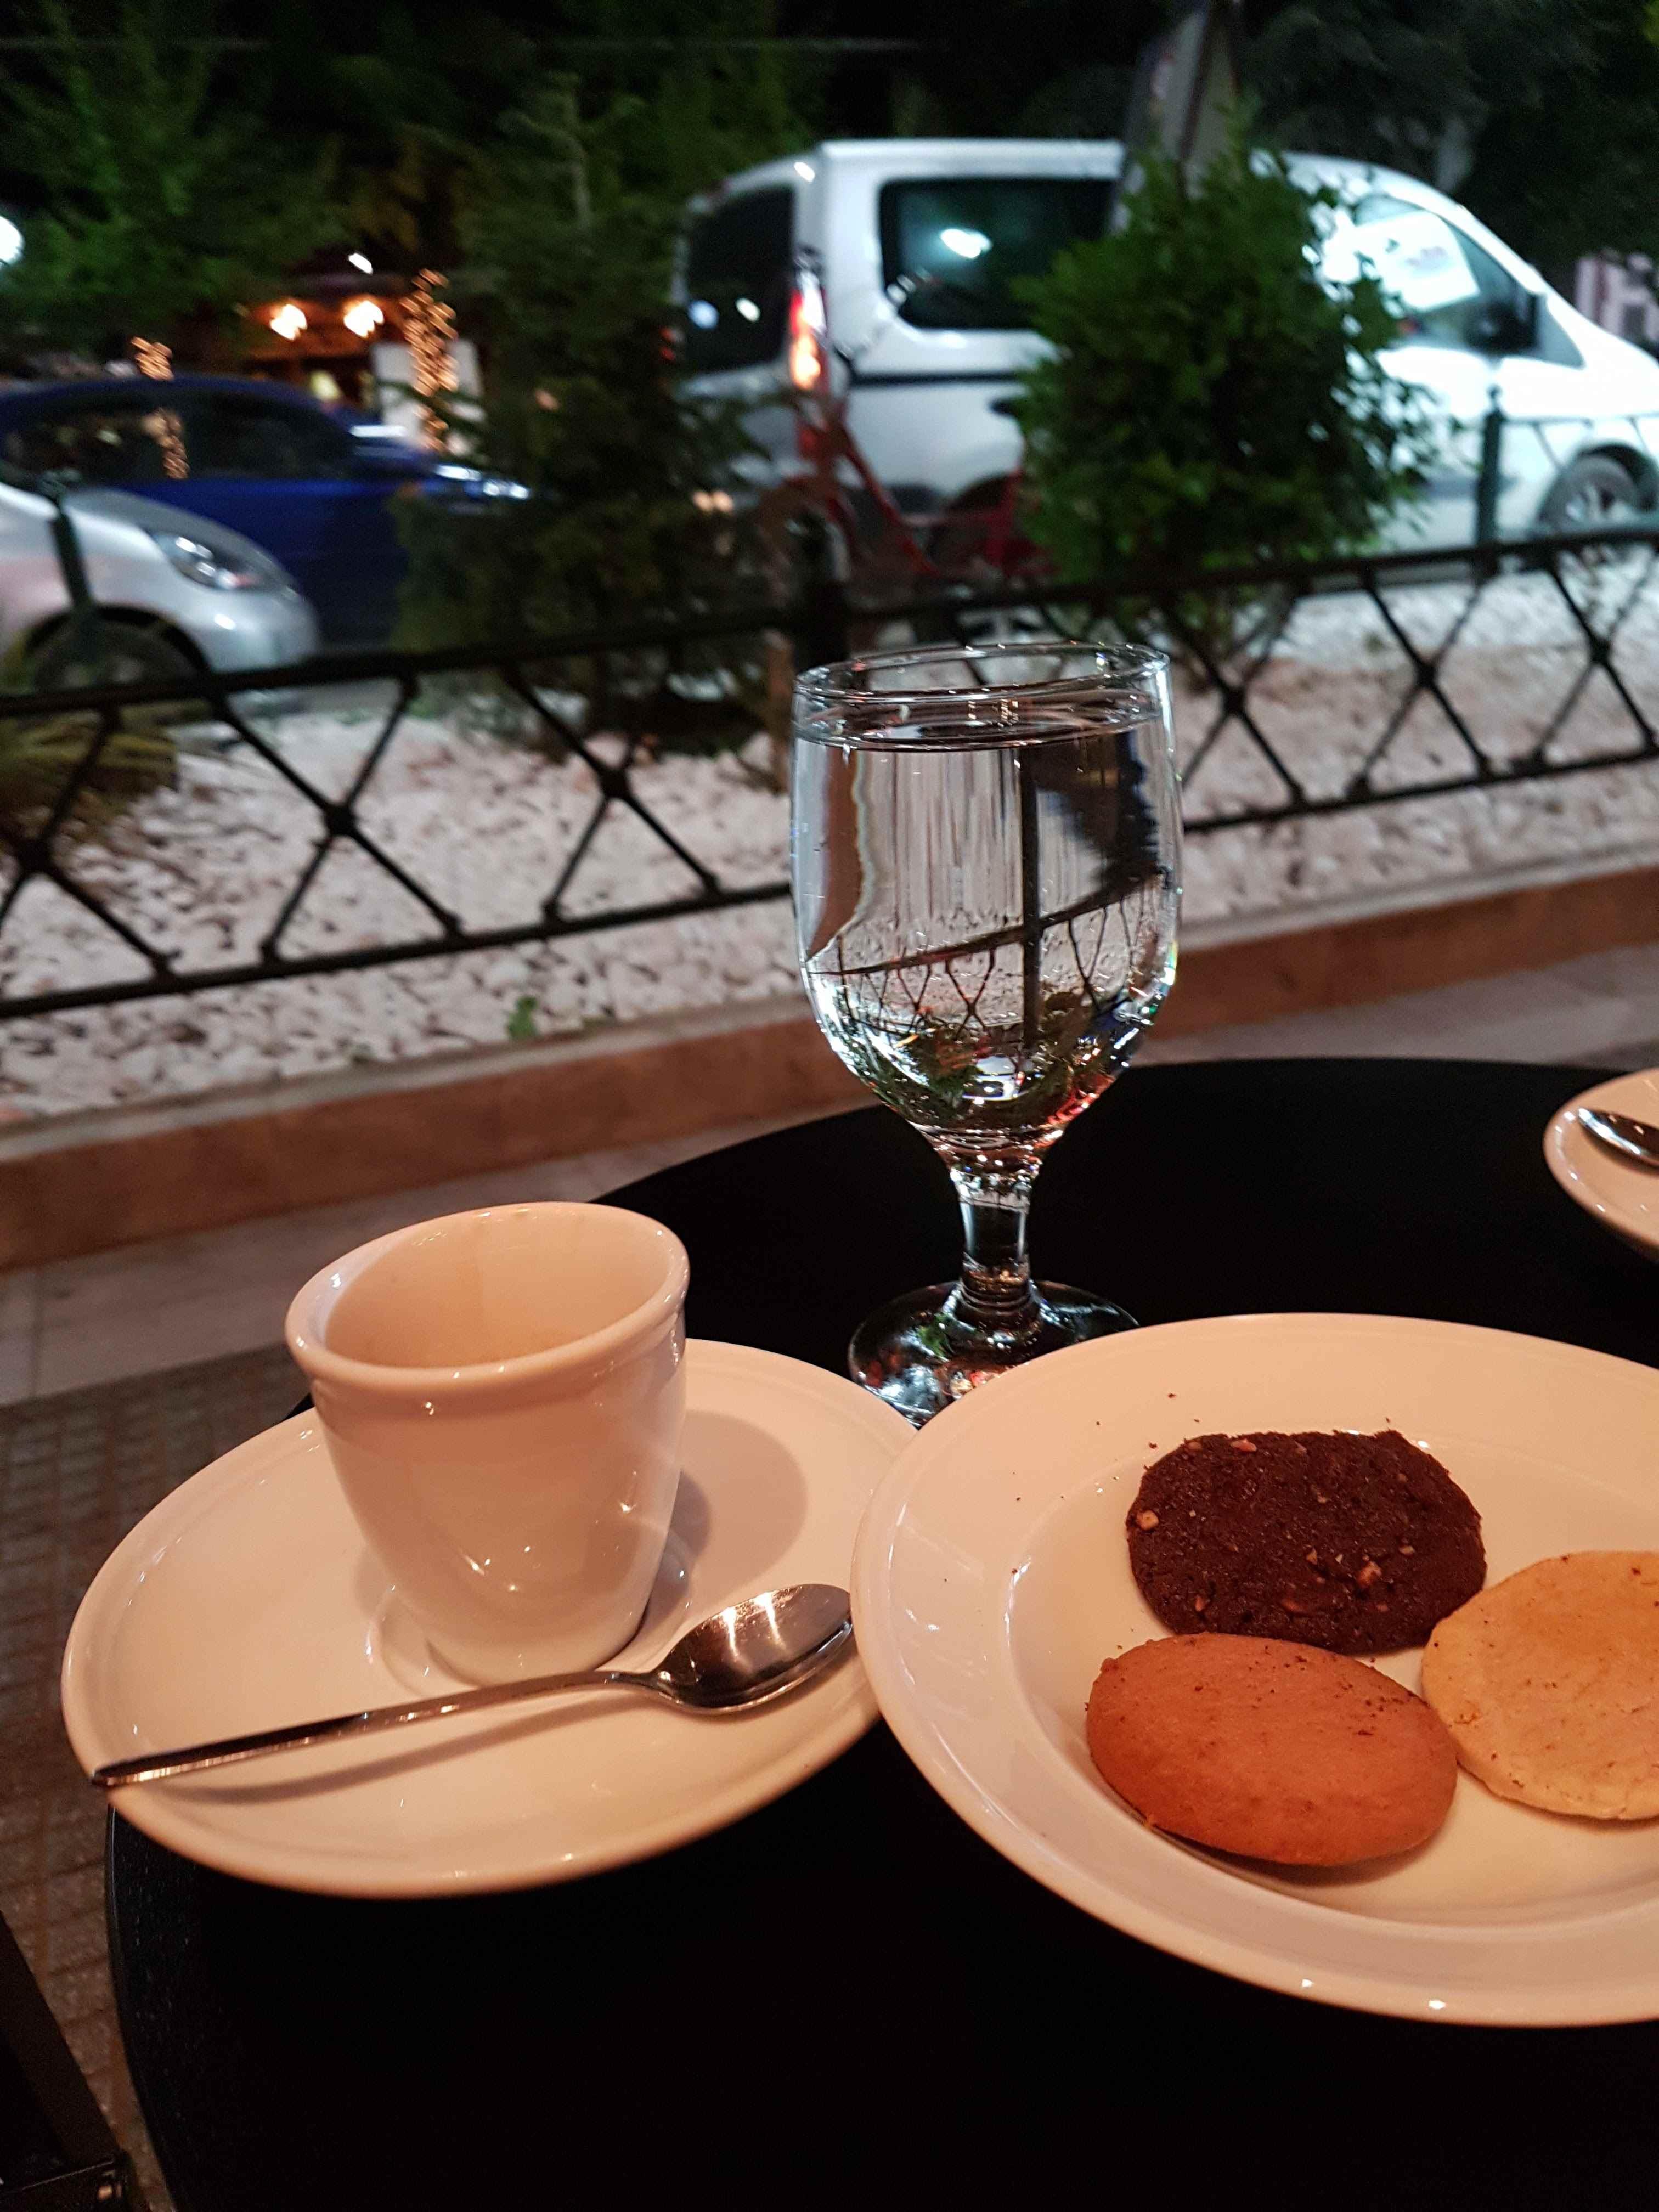 yesempatik-alexandroupoli-mekan-rehberi-yeme-icme-mikel-kahve